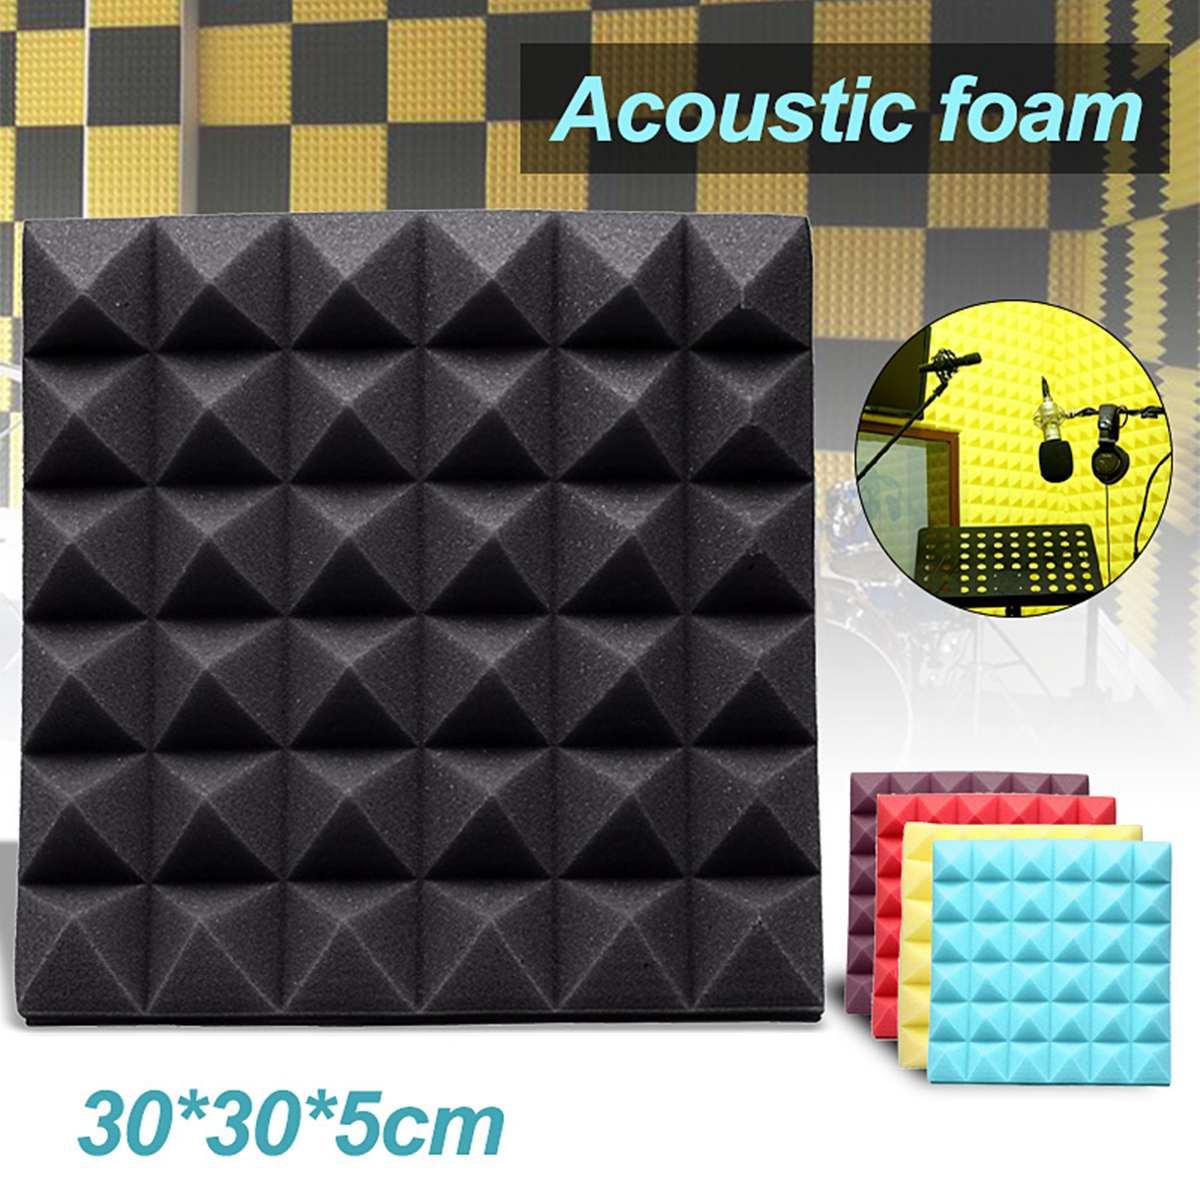 Newest 30*30*5cm Studio Acoustic Soundproof Foam Sound Absorption Treatment Panel Tile Wedge Protective Sponge